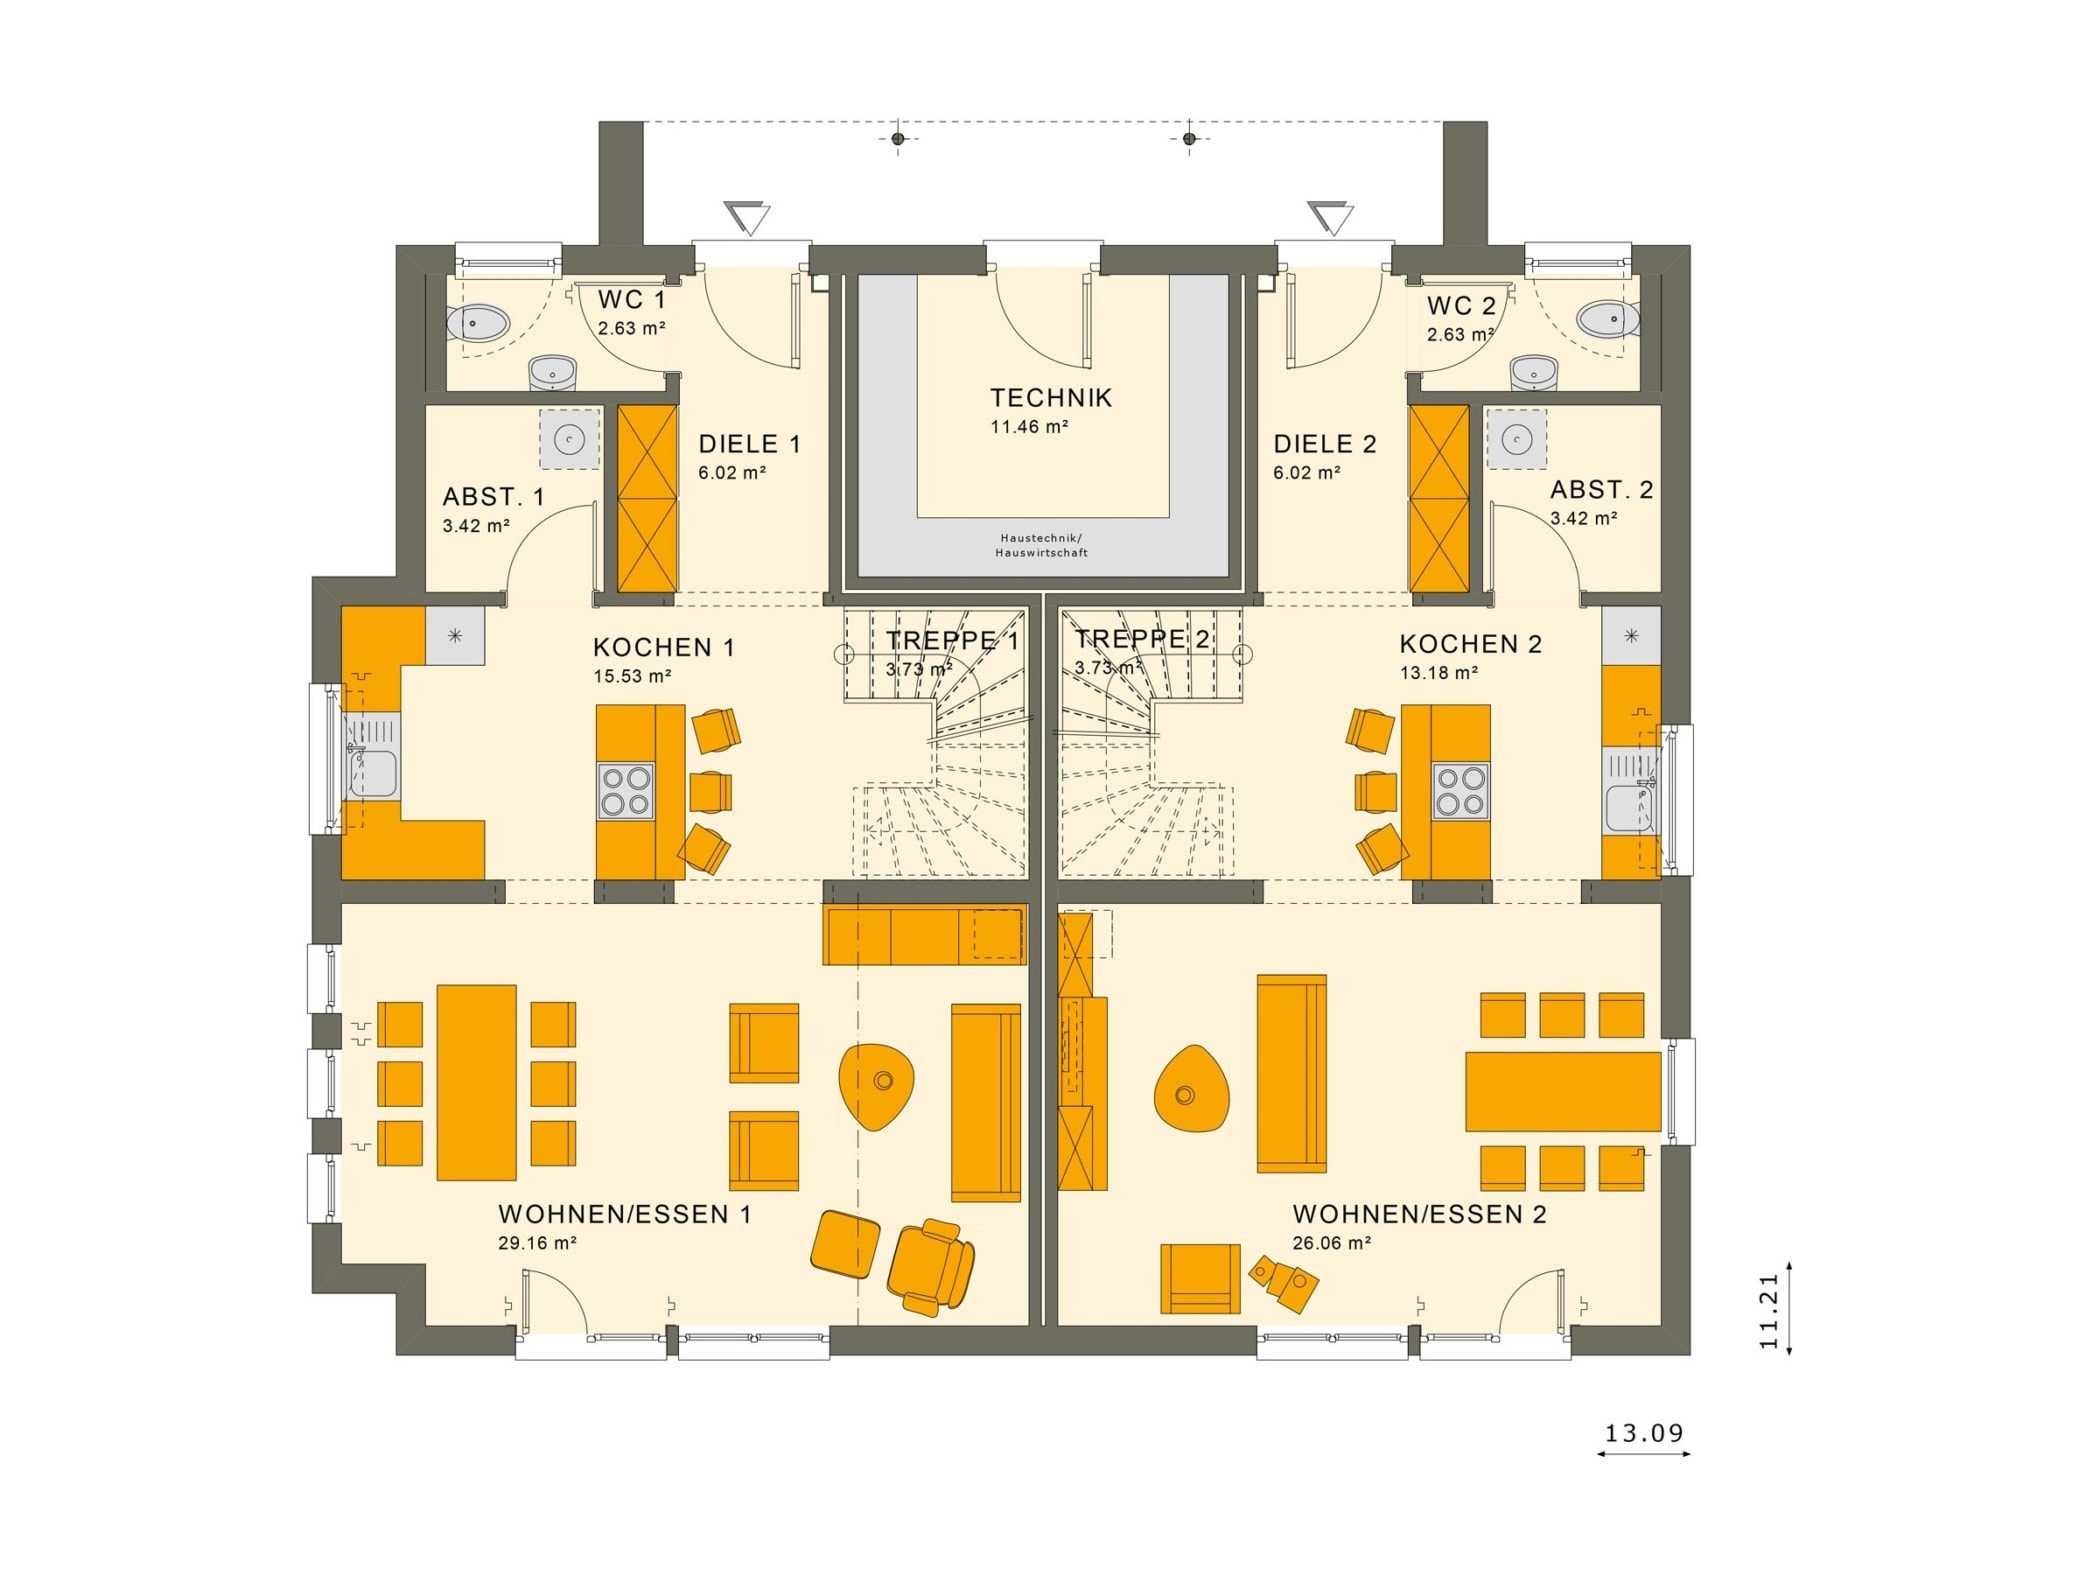 Grundriss Zweifamilienhaus Wohnungen nebeneinander Erdgeschoss - Doppelhaus bauen Ideen Fertighaus SOLUTION 242 V4 von Living Haus - HausbauDirekt.de